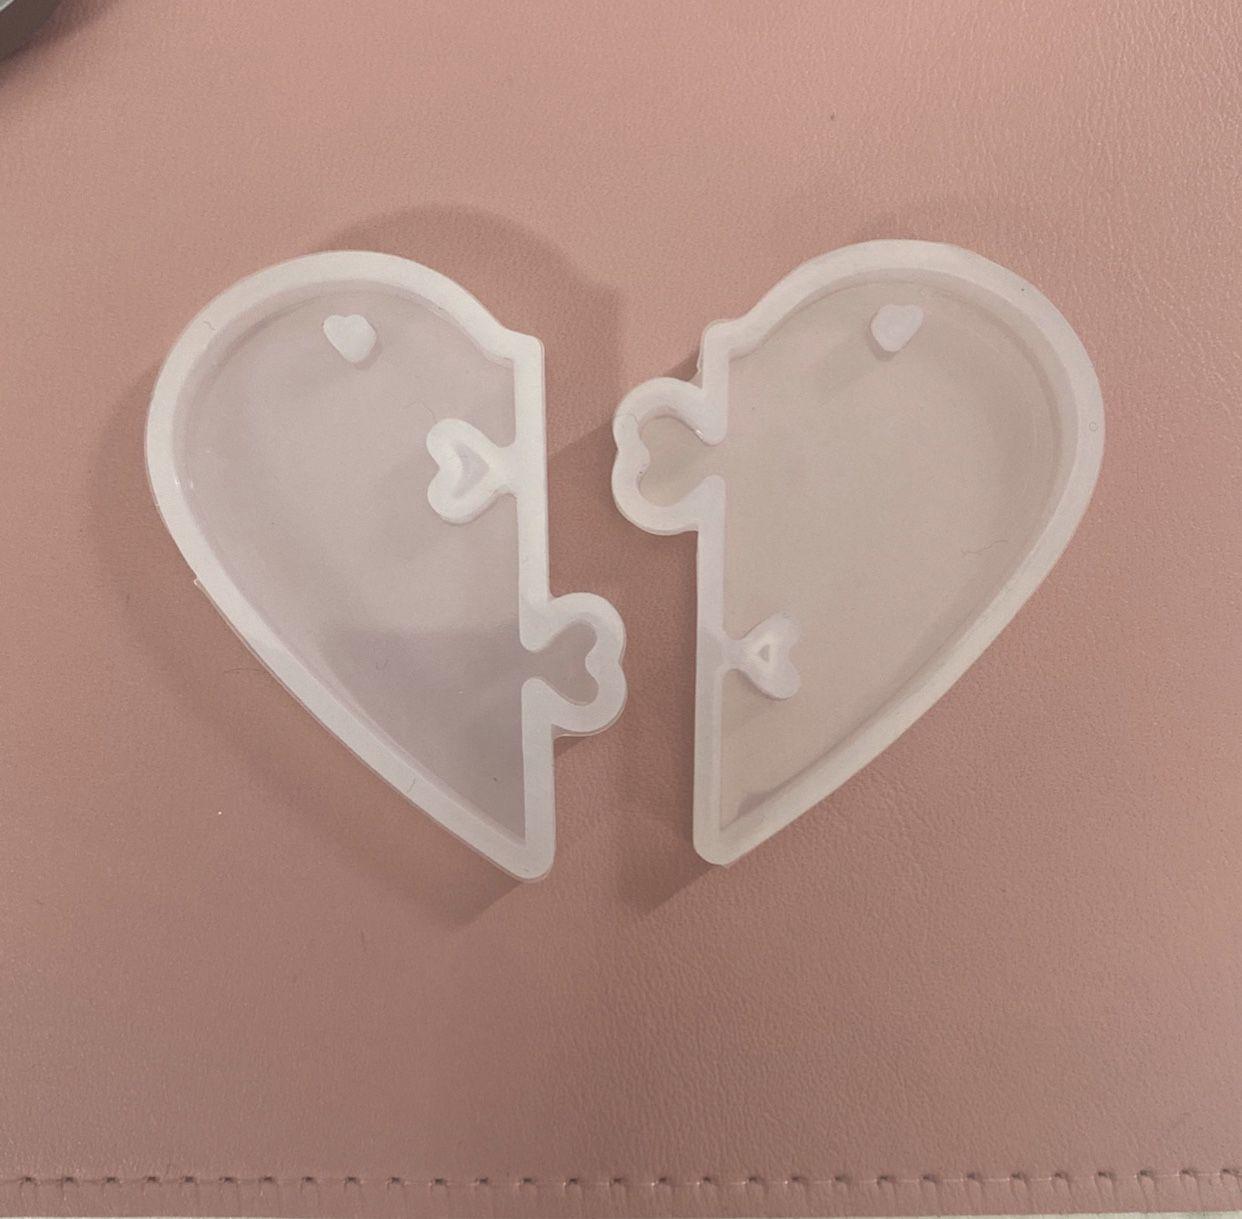 Locking Heart Silicone Keychain Molds (set of 2)